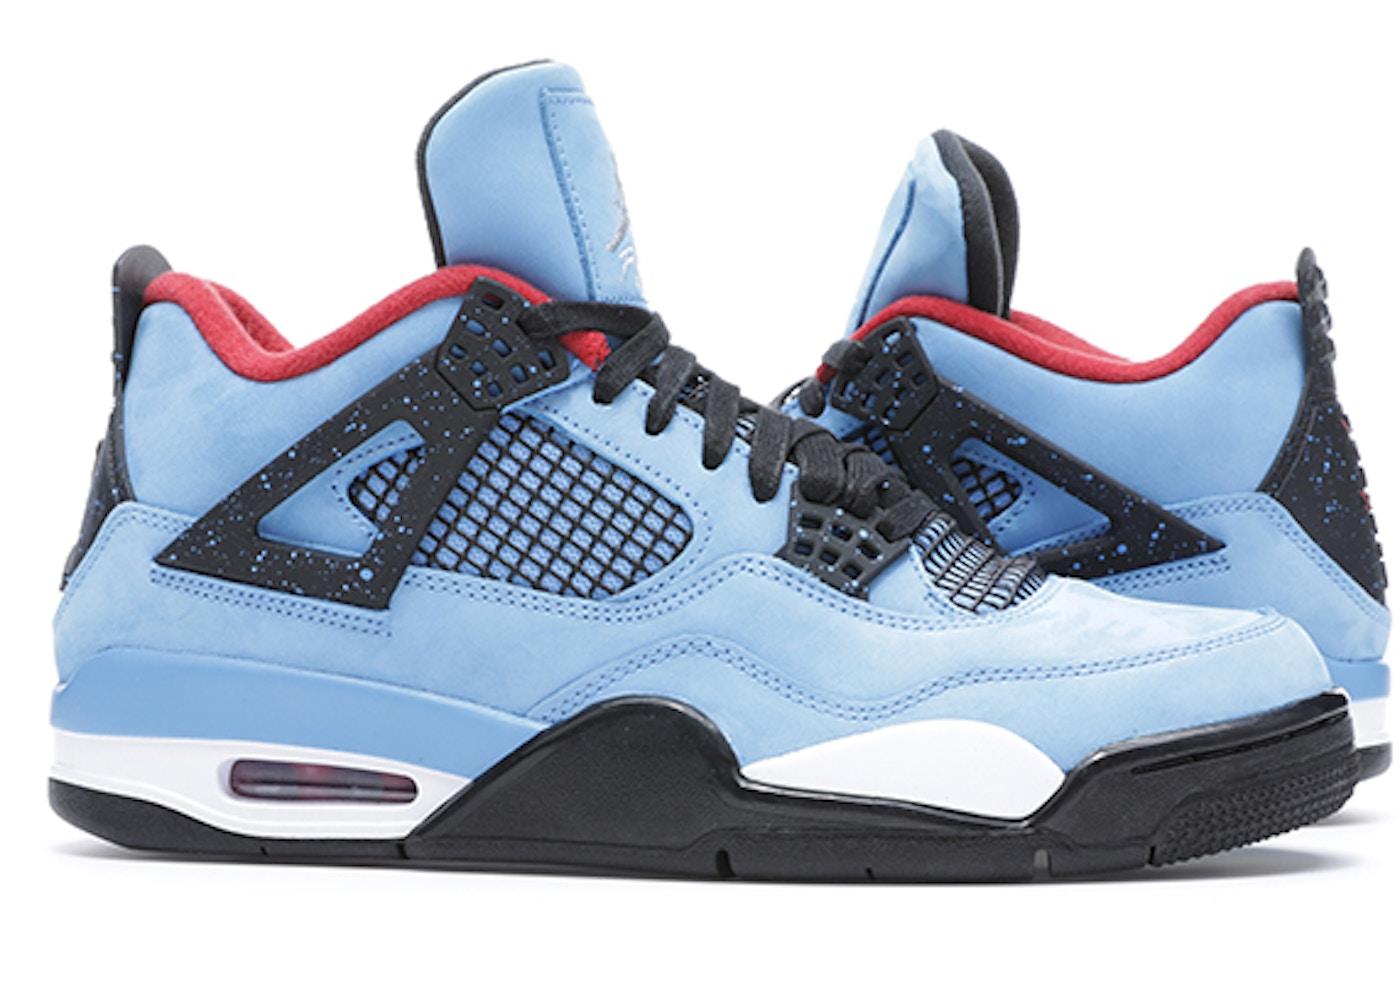 03ddd44ca2b6 How To Tell Original Air Jordans Deal On Shoes   BASF